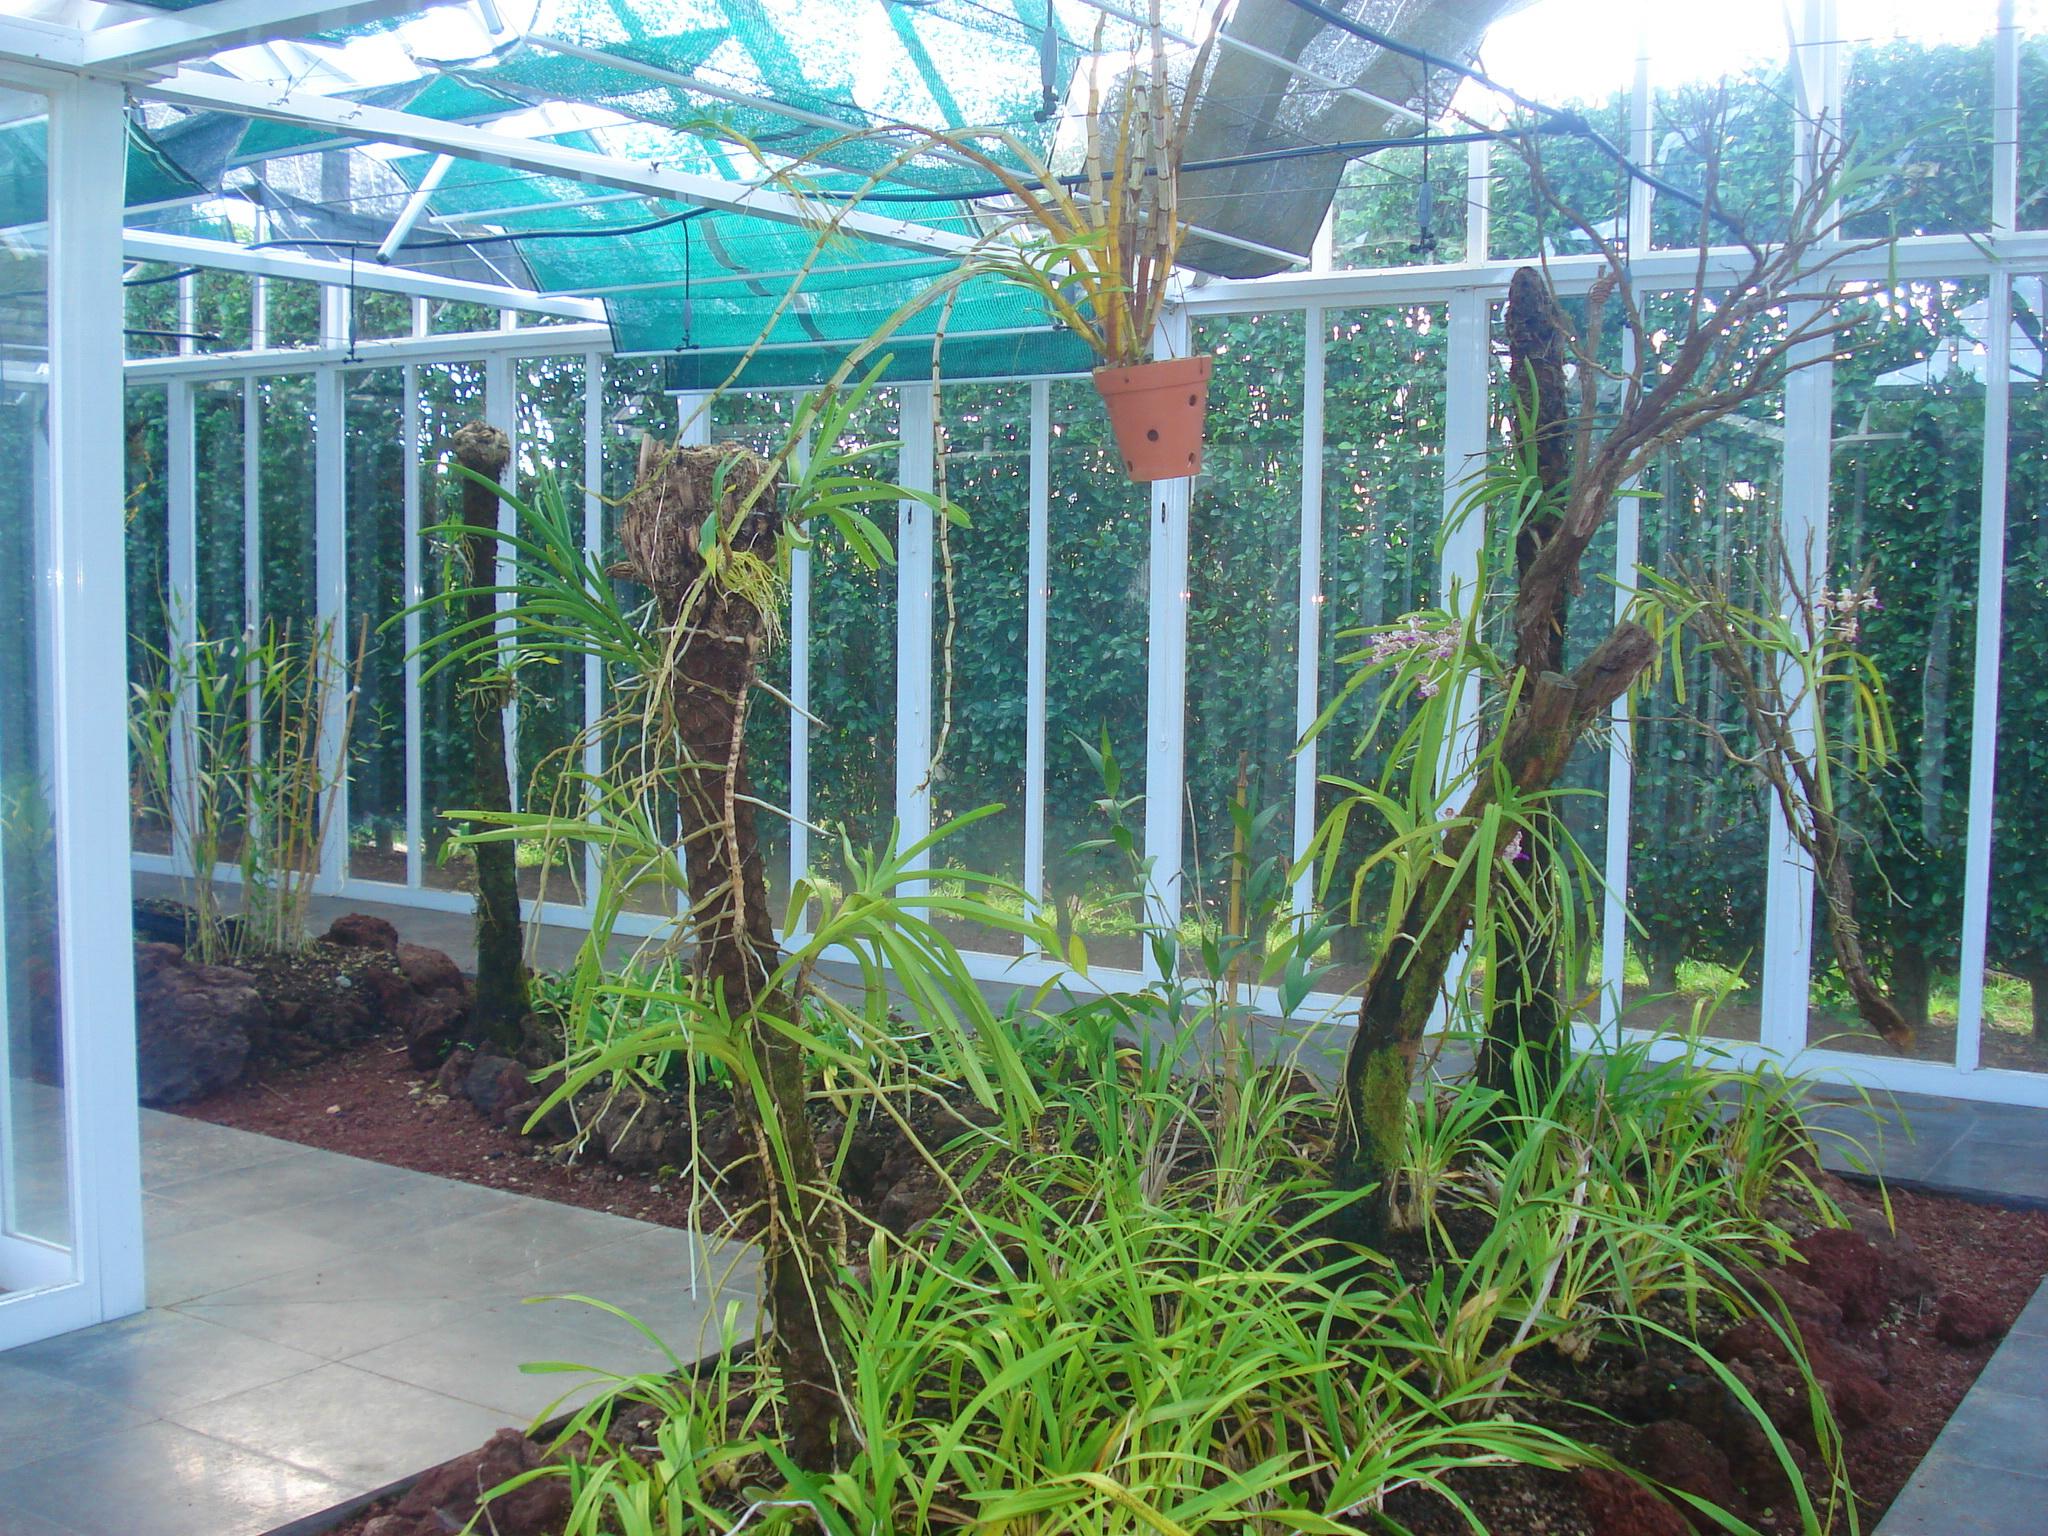 jardim botanico horta faial:Interior Botanical Garden